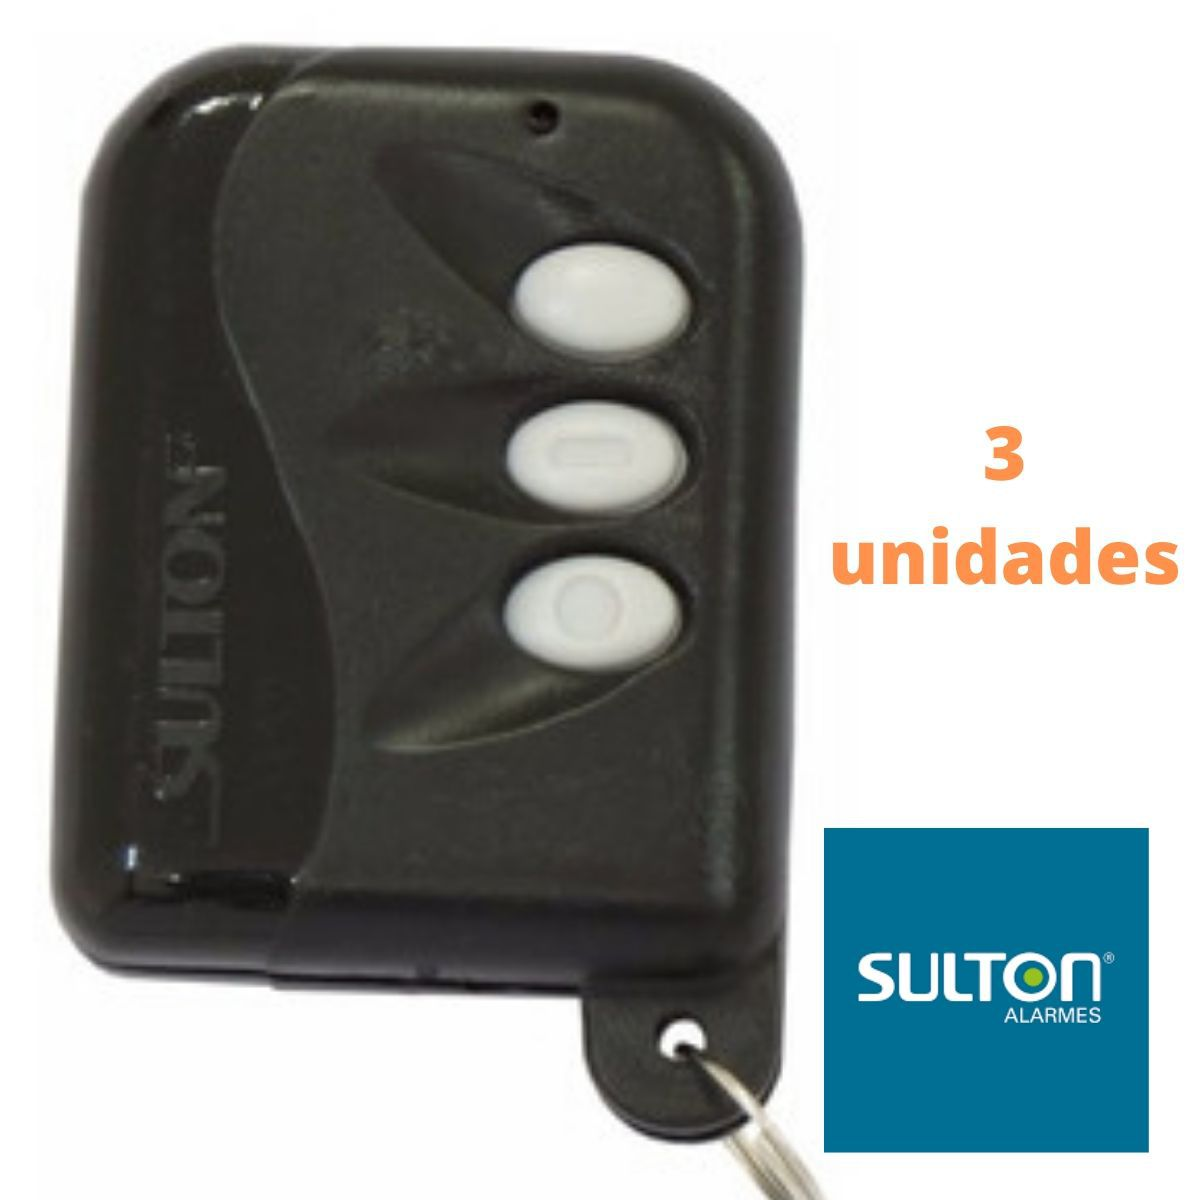 CONTROLE TCL SULTON  3 unidades